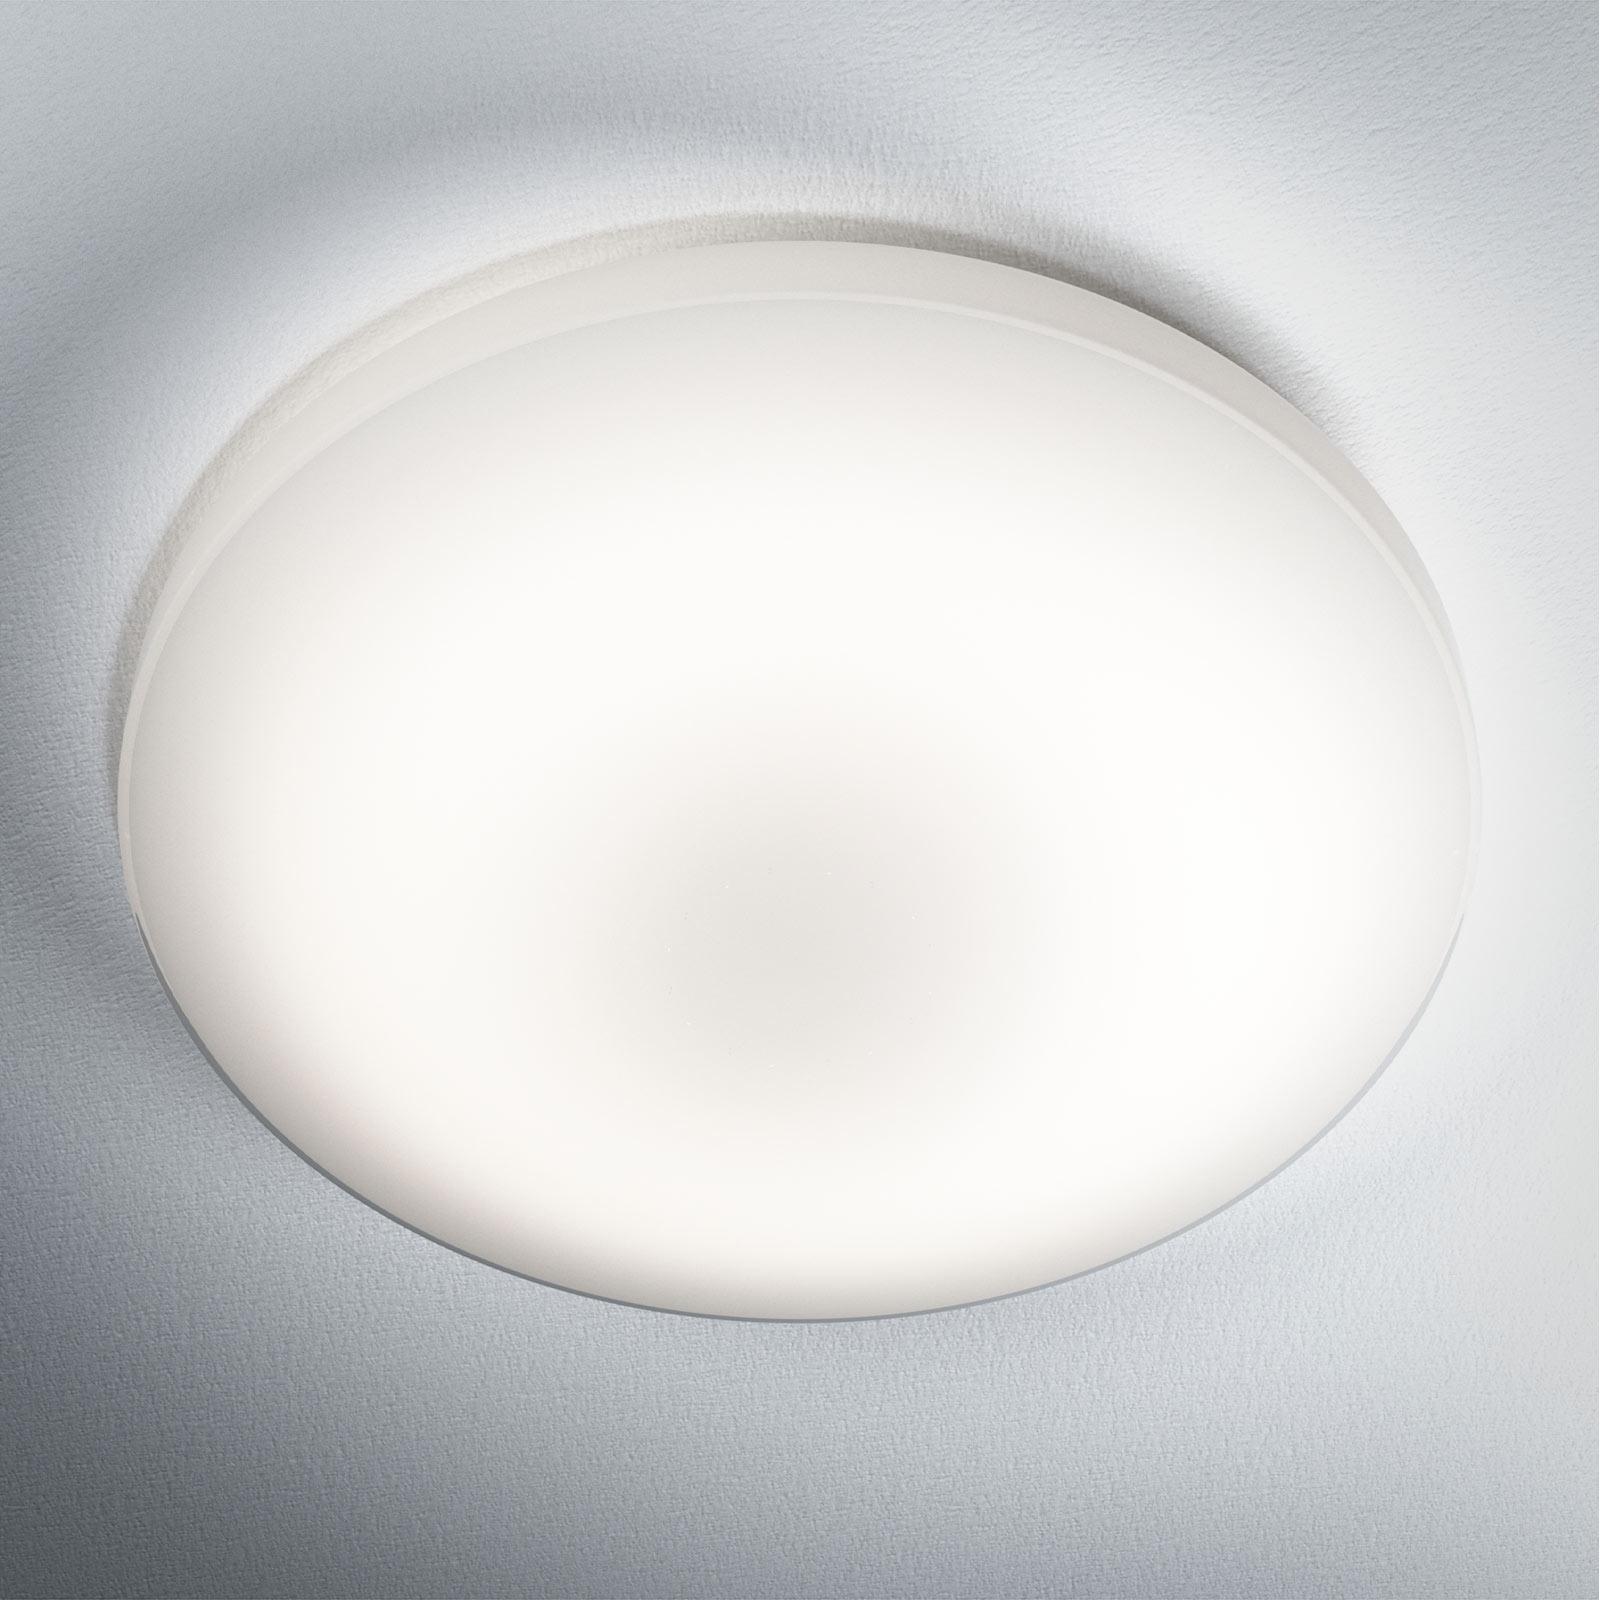 LEDVANCE Orbis Pure LED taklampe 30 cm 10 W | Lampegiganten.no